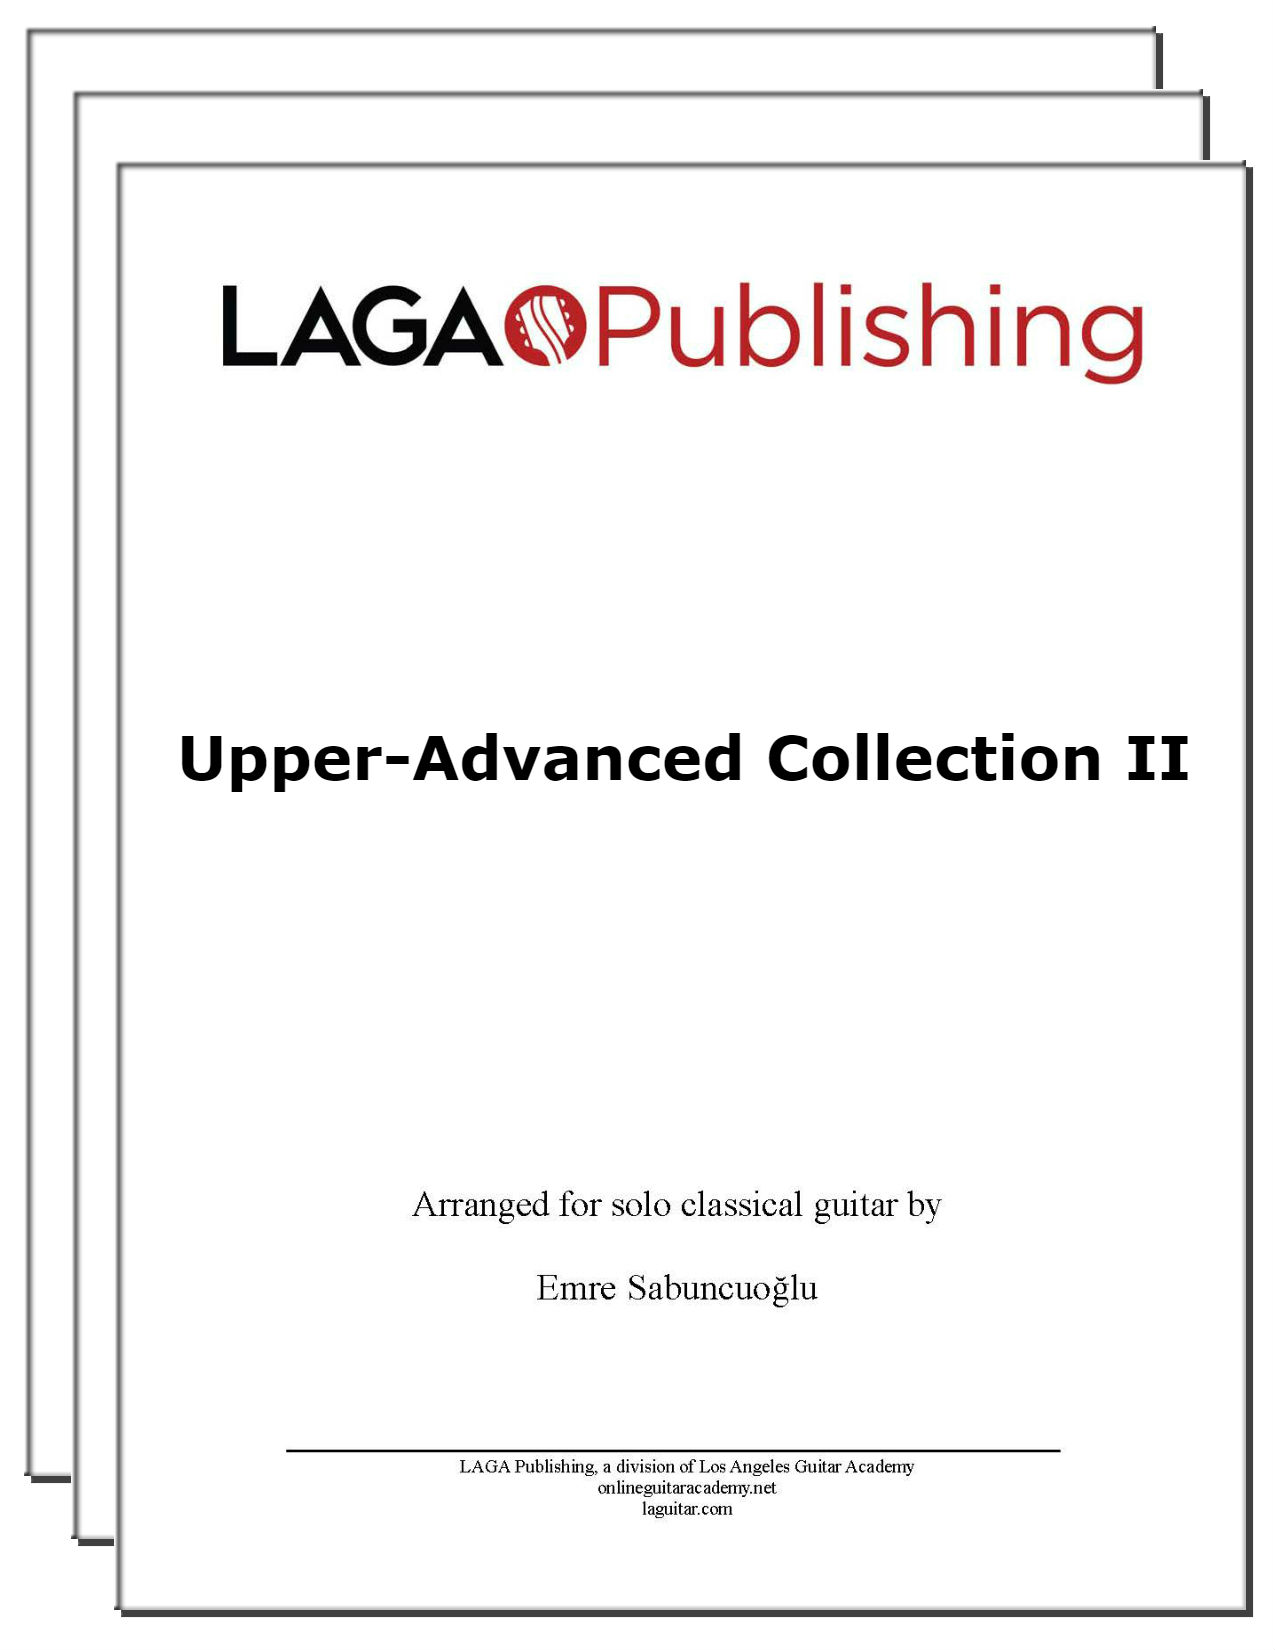 LAGA-Publishing-Upper-Advanced-Collection-II